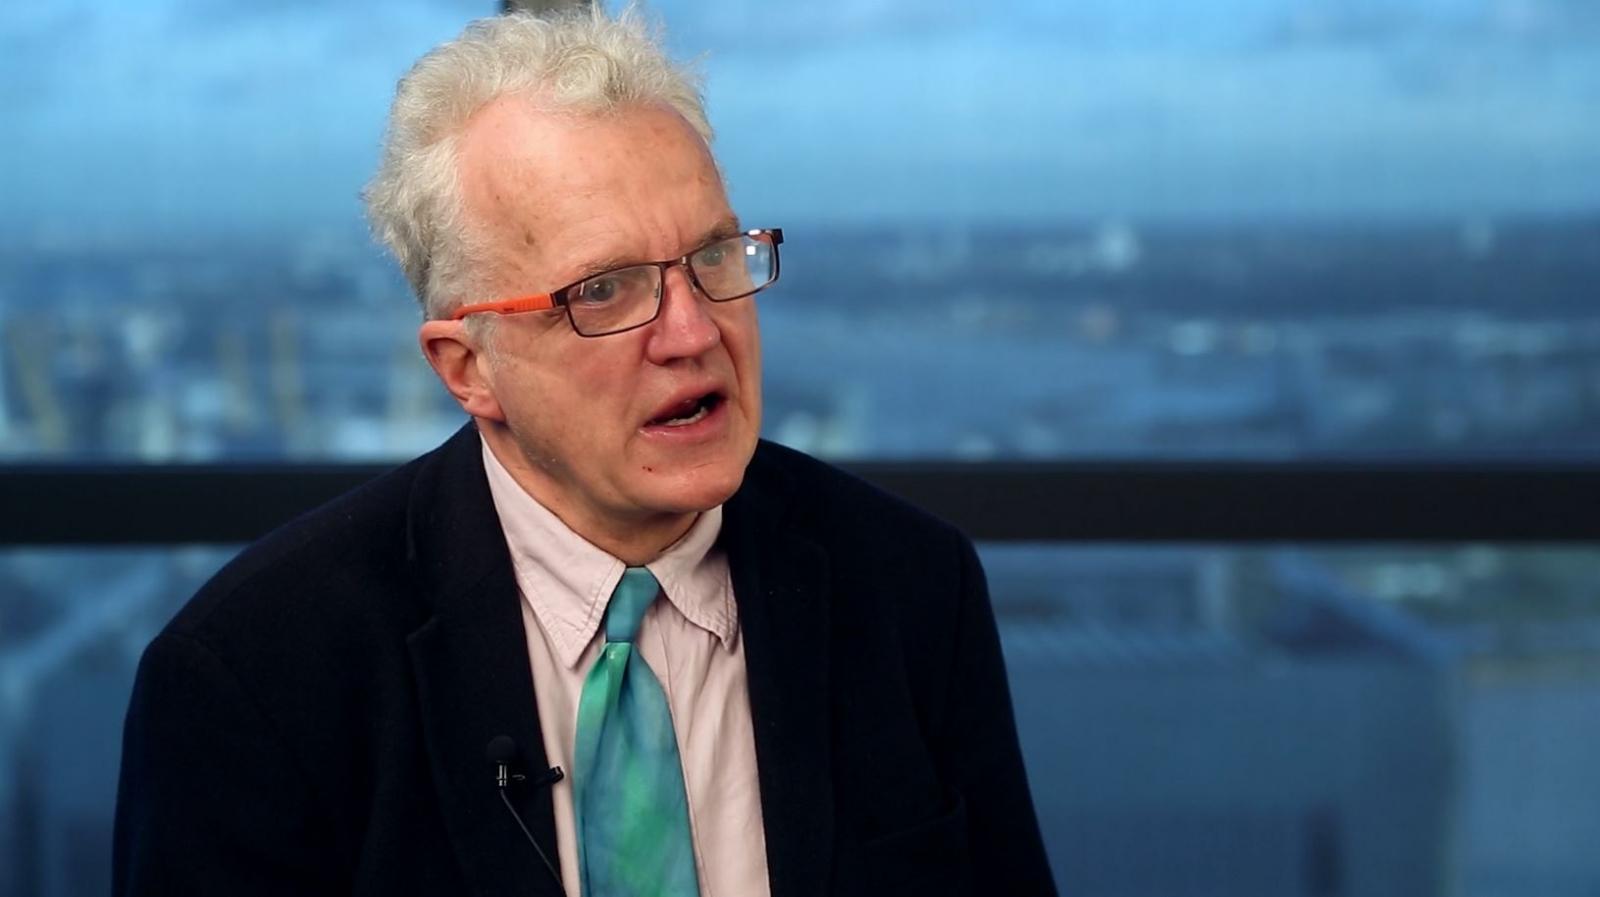 Christian Wolmar on his bid to become Mayor of London